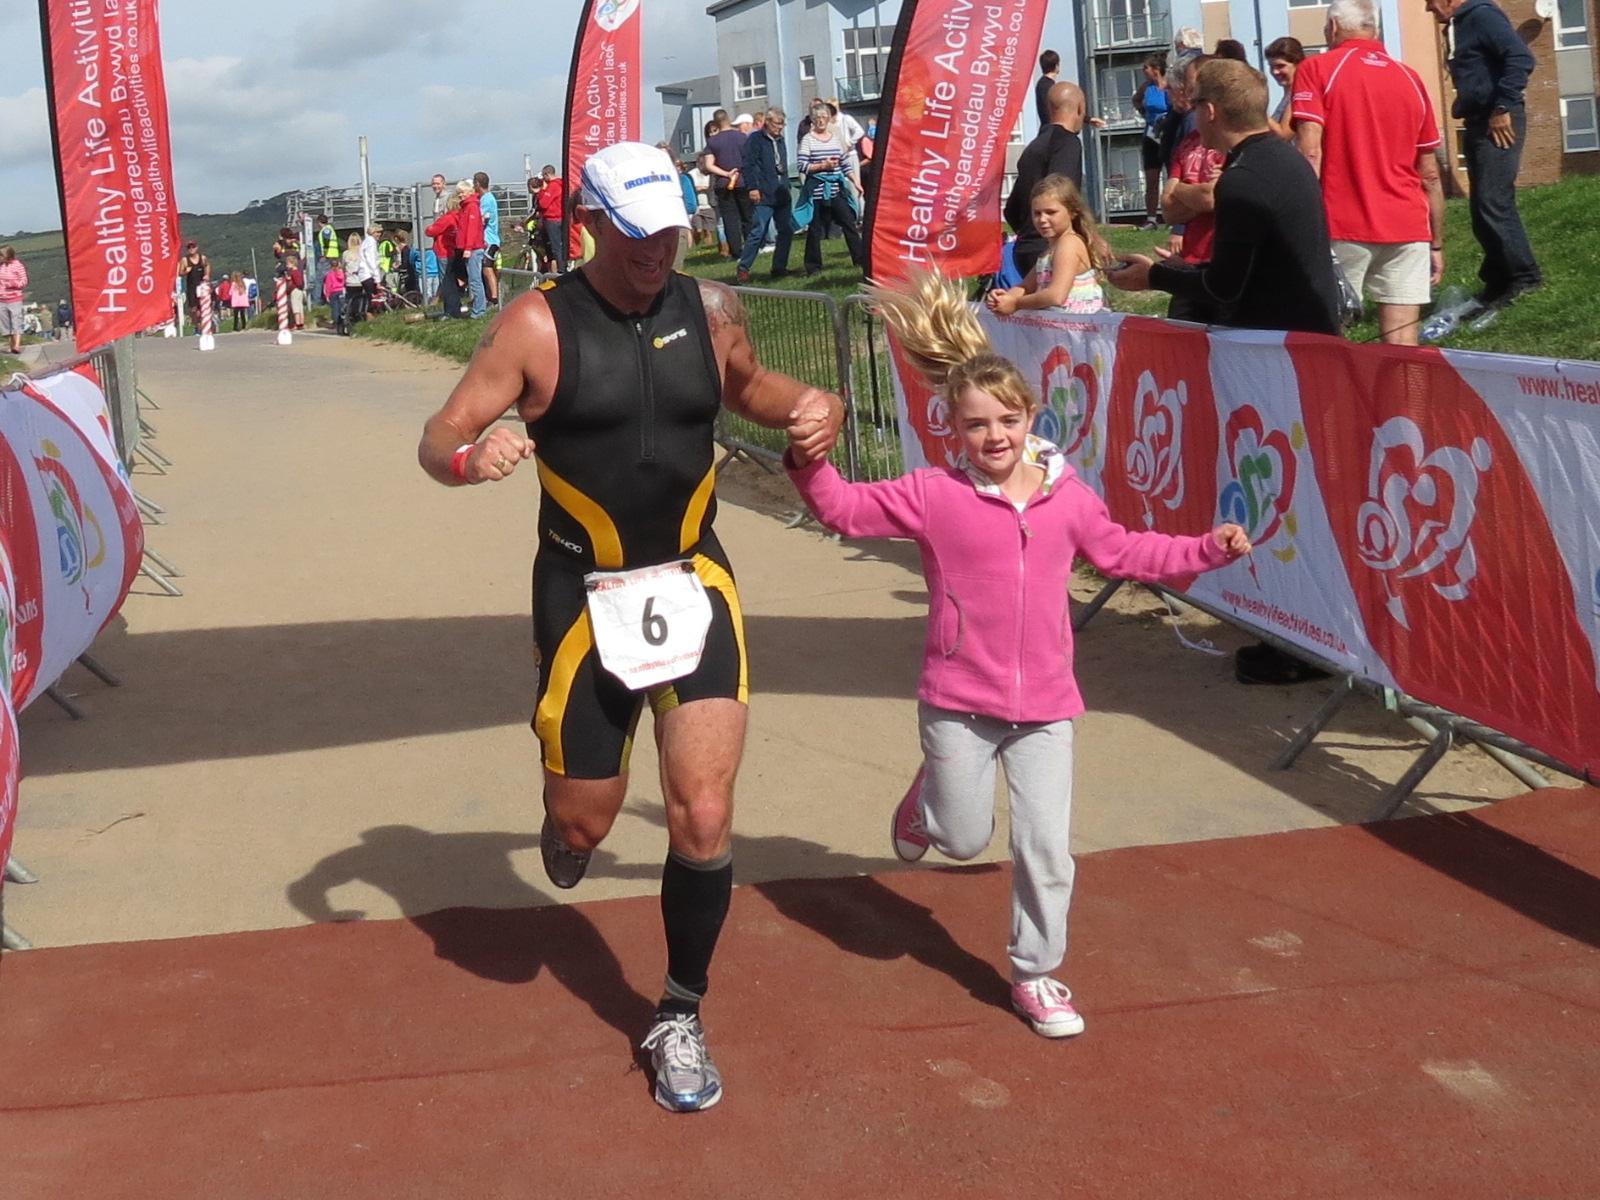 Llanelli Sprint Triathlon » Healthy Life Activities